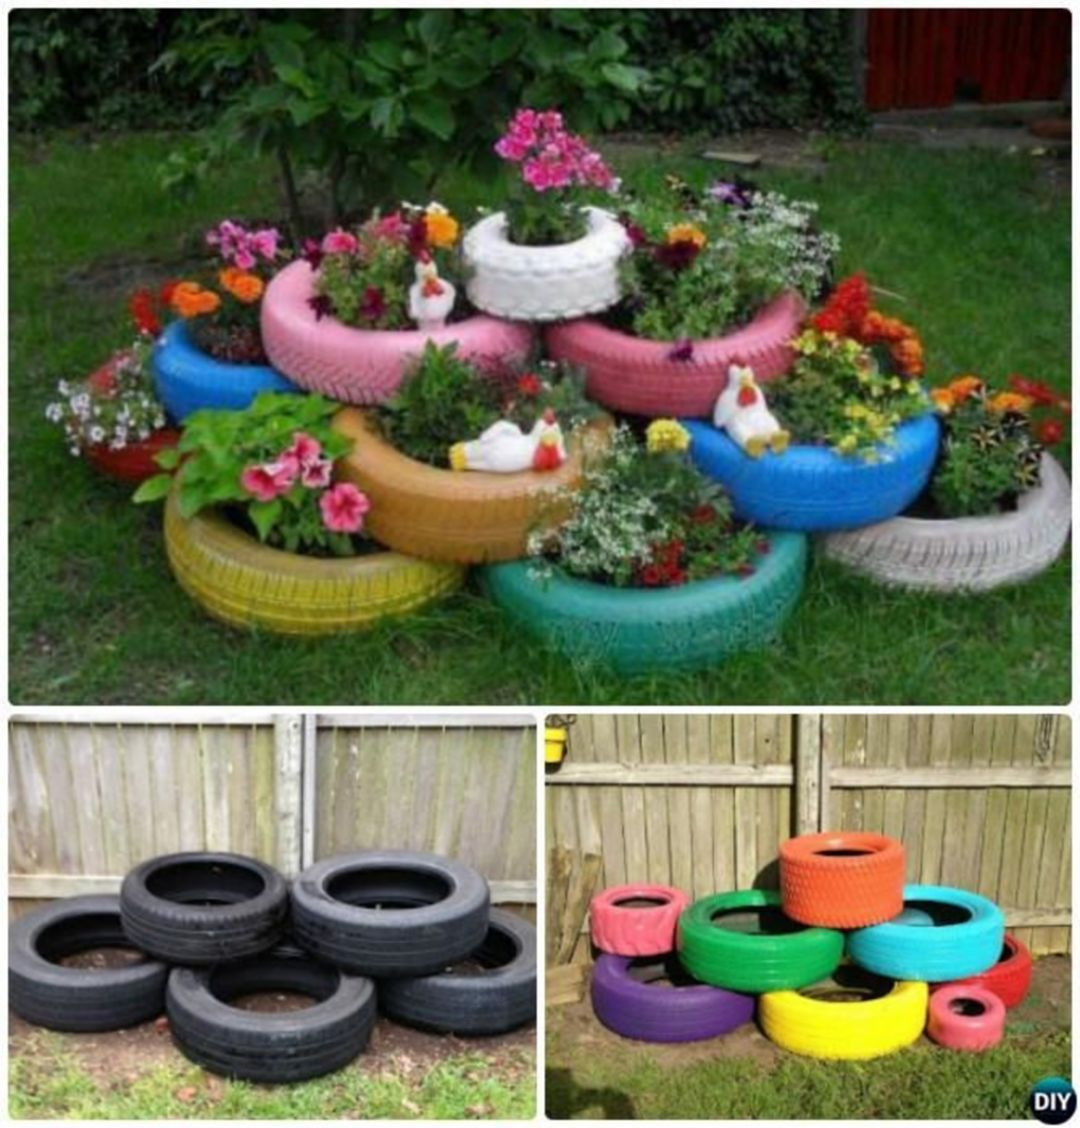 Beau Astounding 30 Impressive DIY Tire Planters Ideas For Your Garden To Amaze  Everyone Https:/